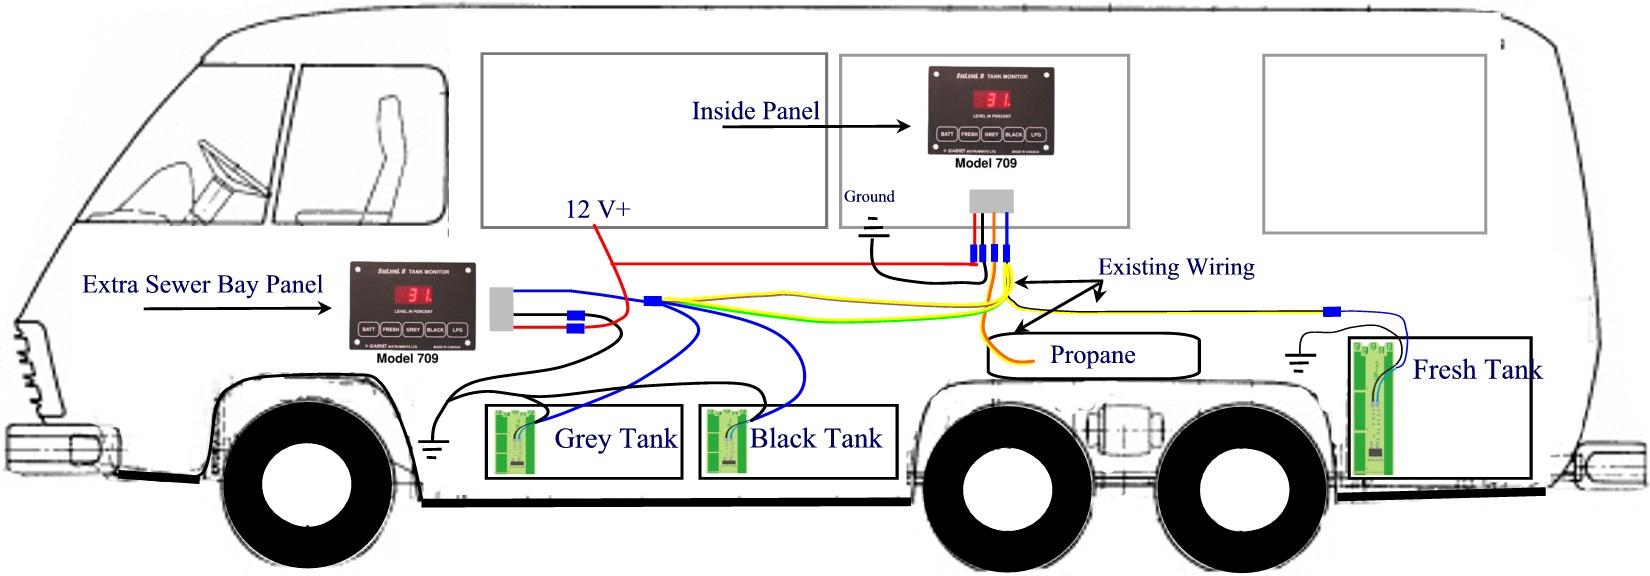 Rv Tank Monitor Wiring Diagram   Wiring Diagram - R V Plug Wiring Diagram